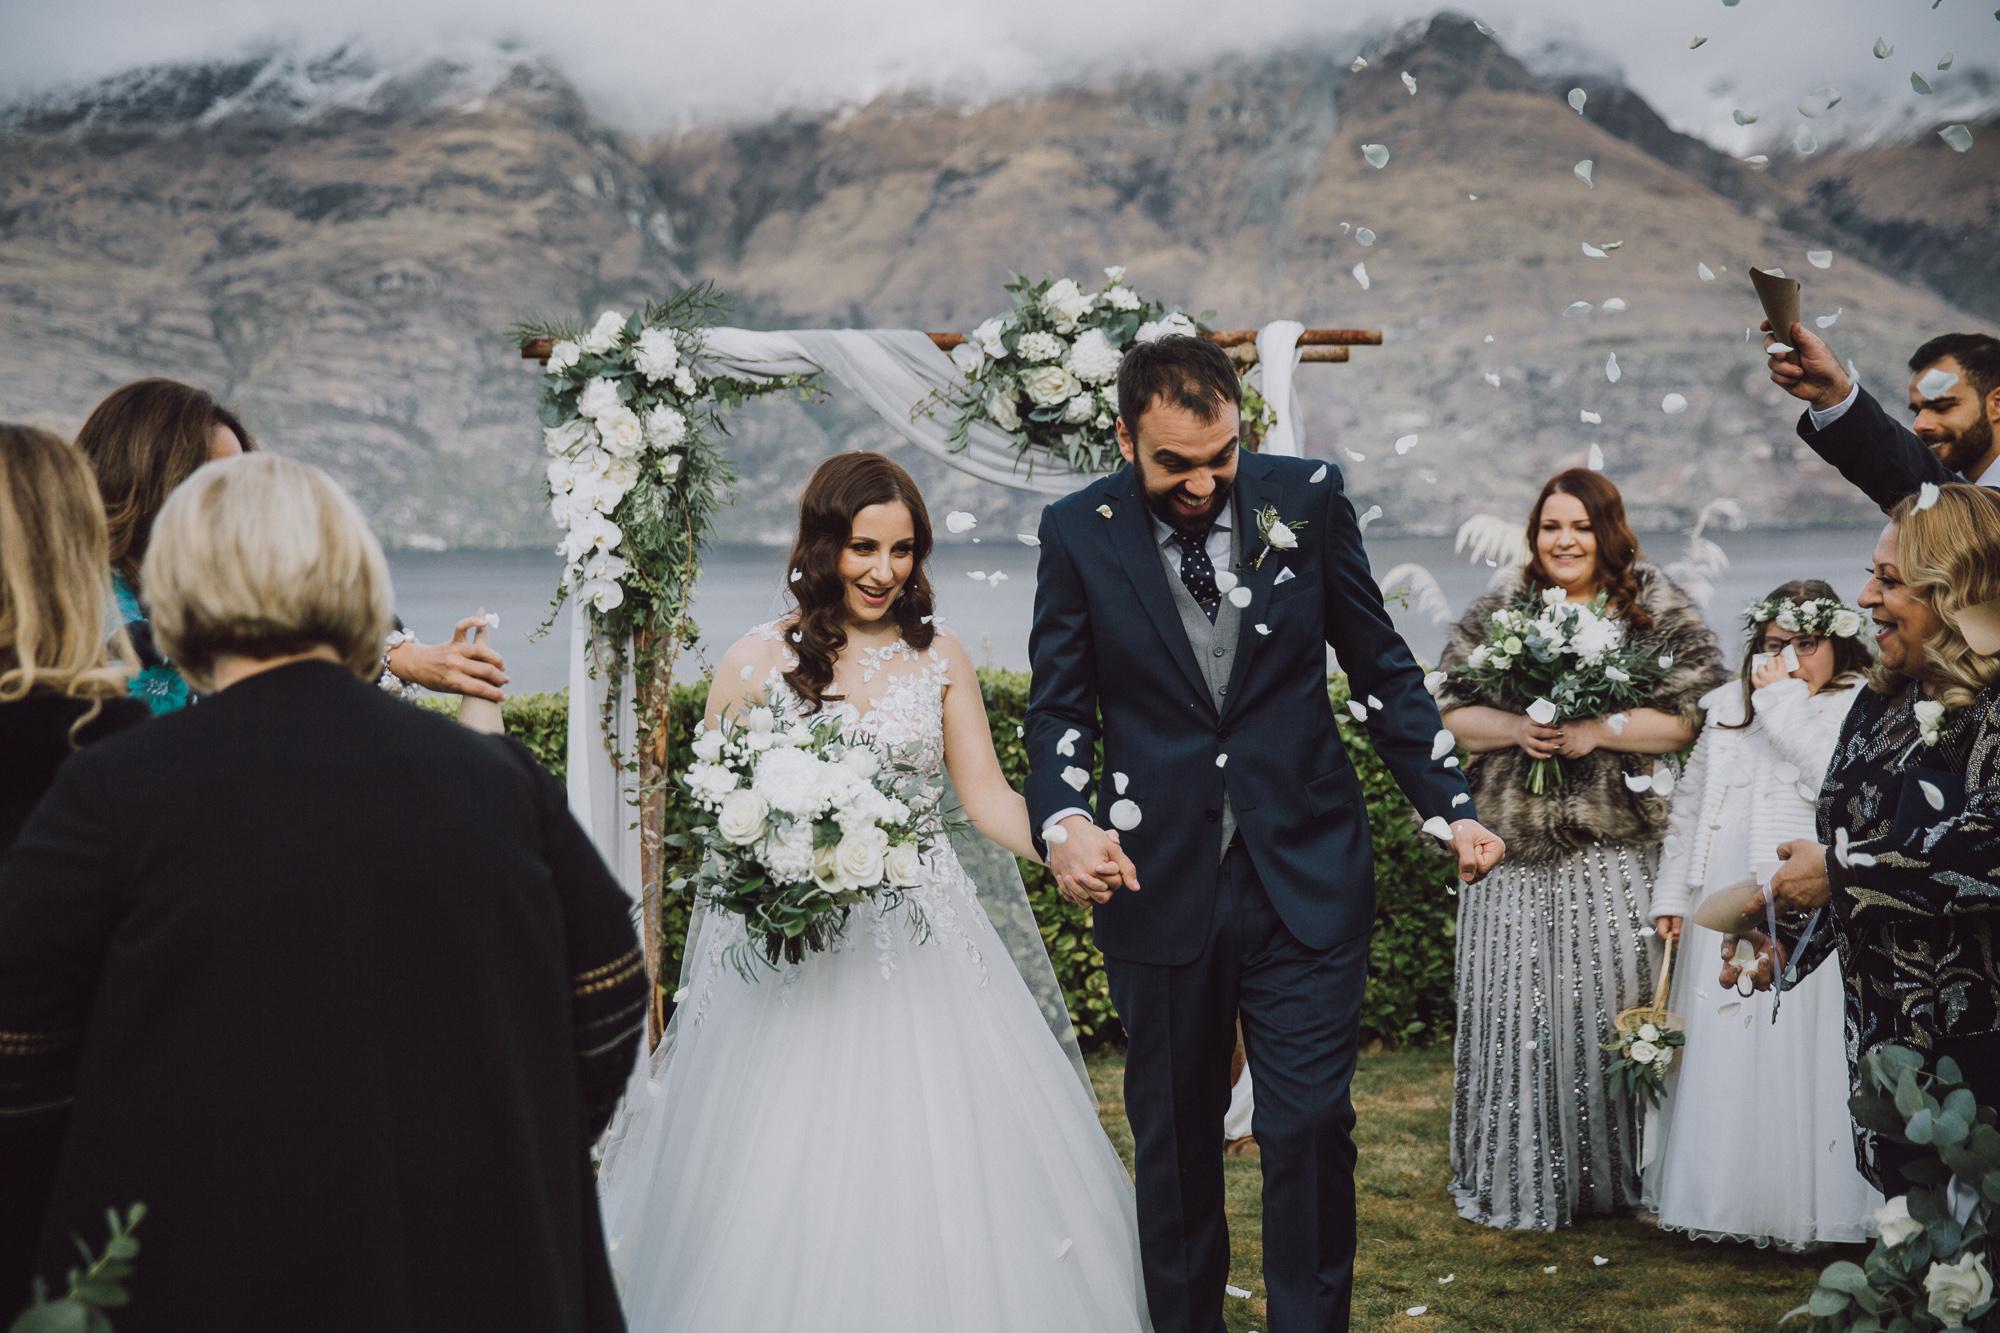 Queenstown Wedding Hire at Matakauri Lodge